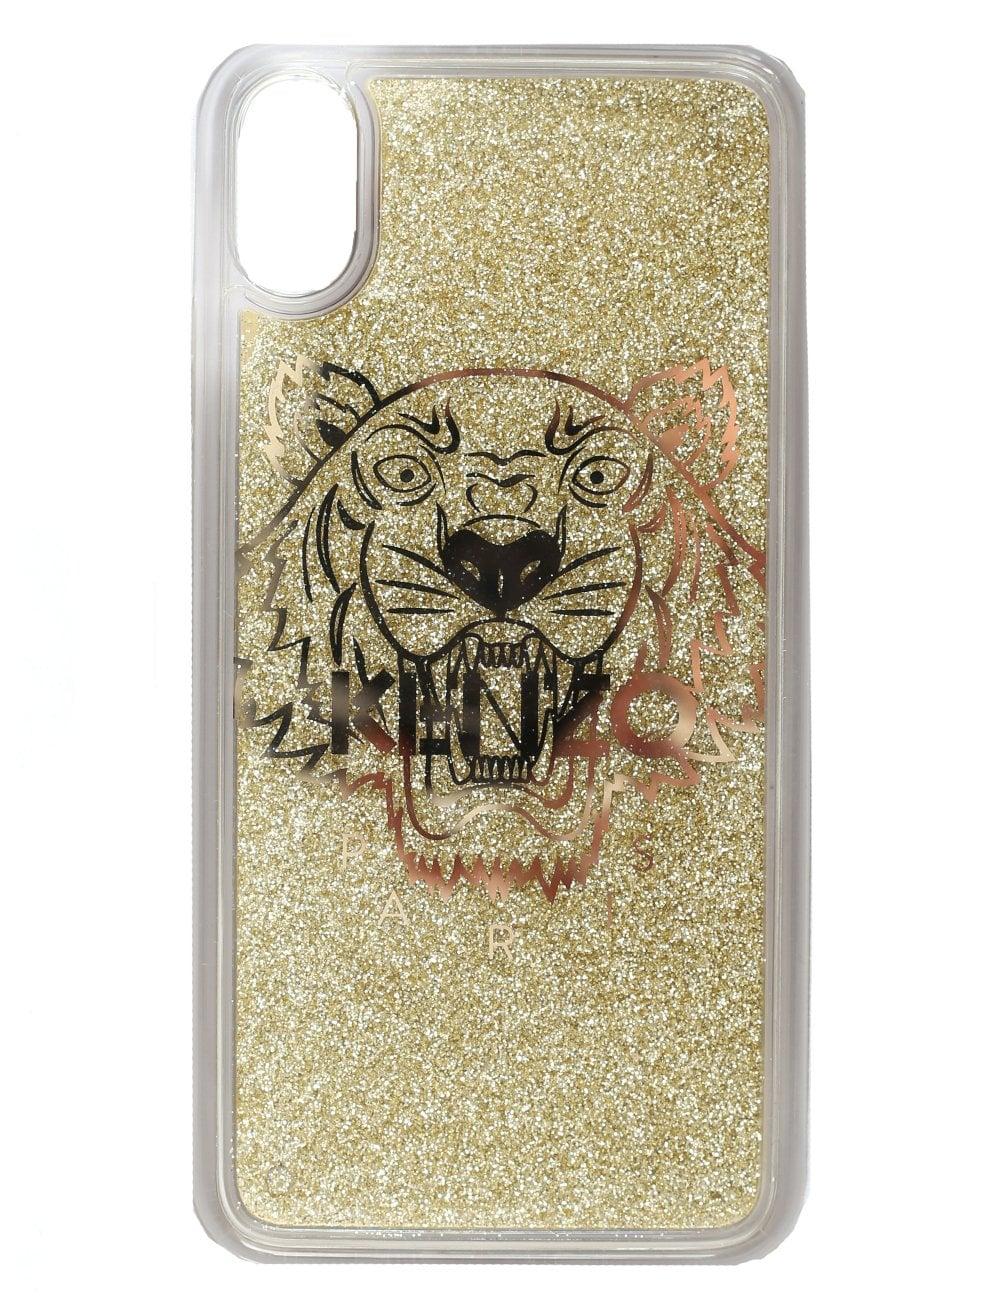 Kenzo Unisex Iphone XS Max Tiger Case 6d1fa0231